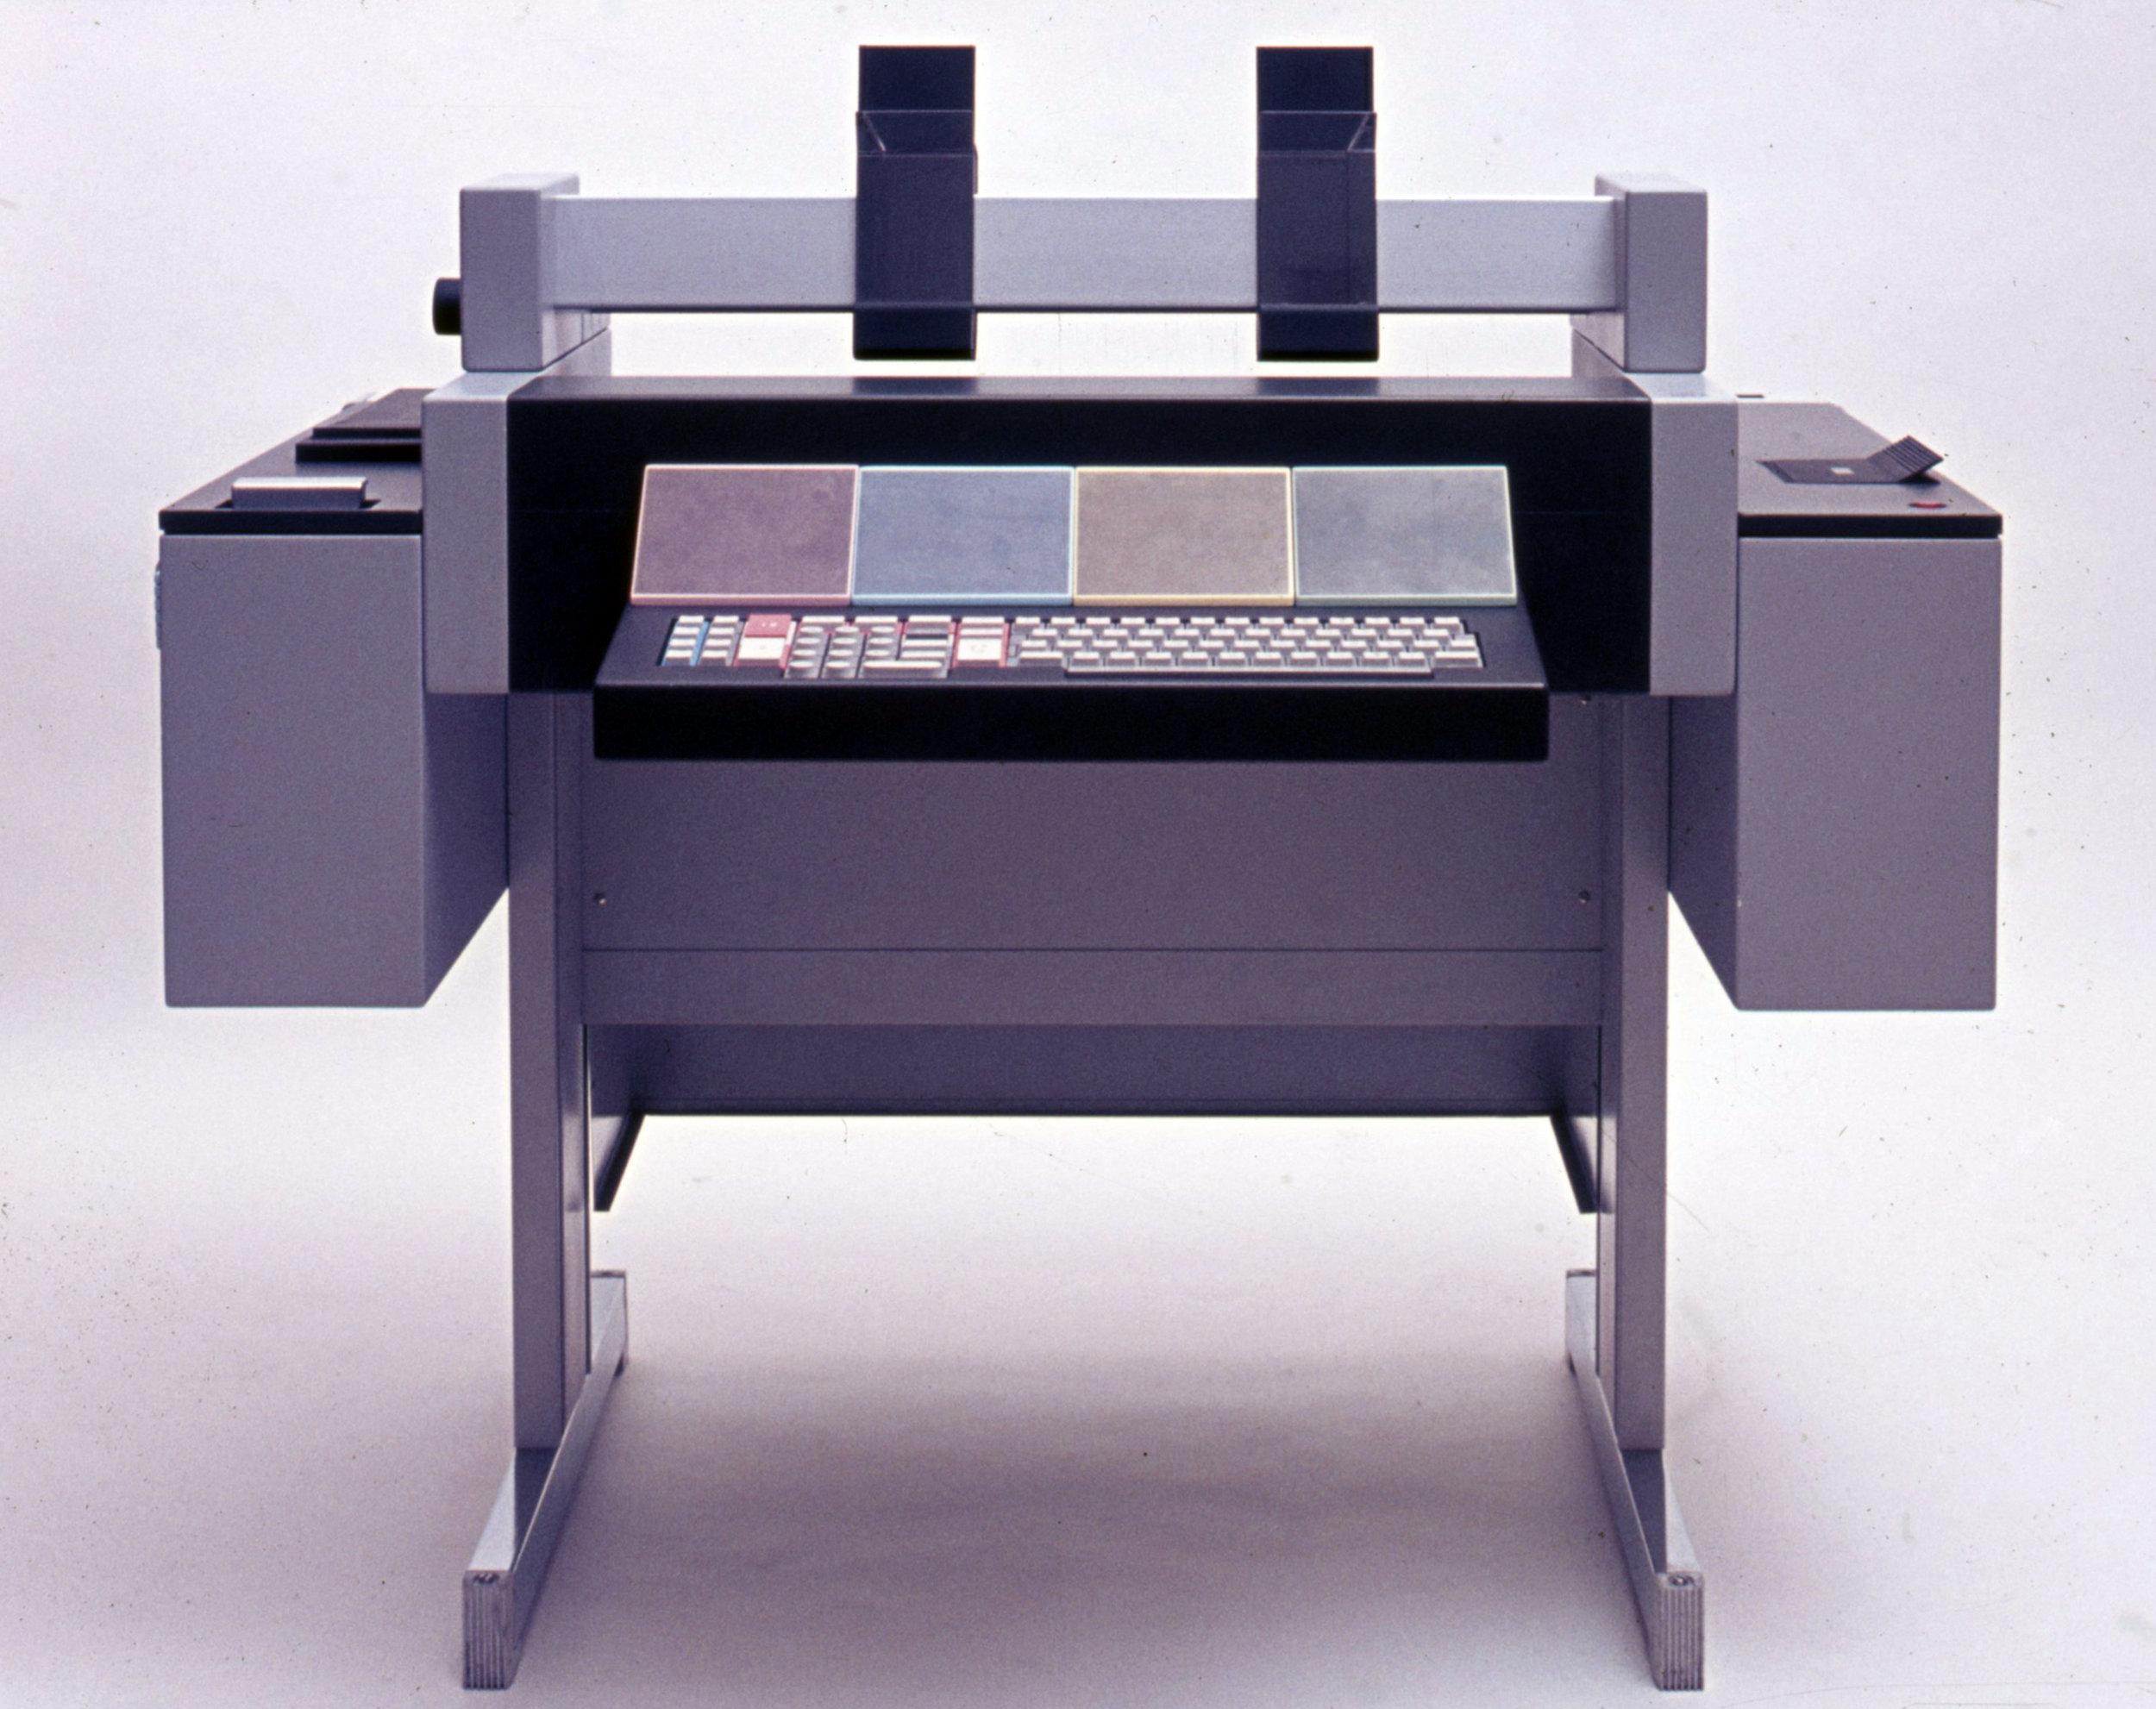 Study for teleprinter, Olivetti, 1972